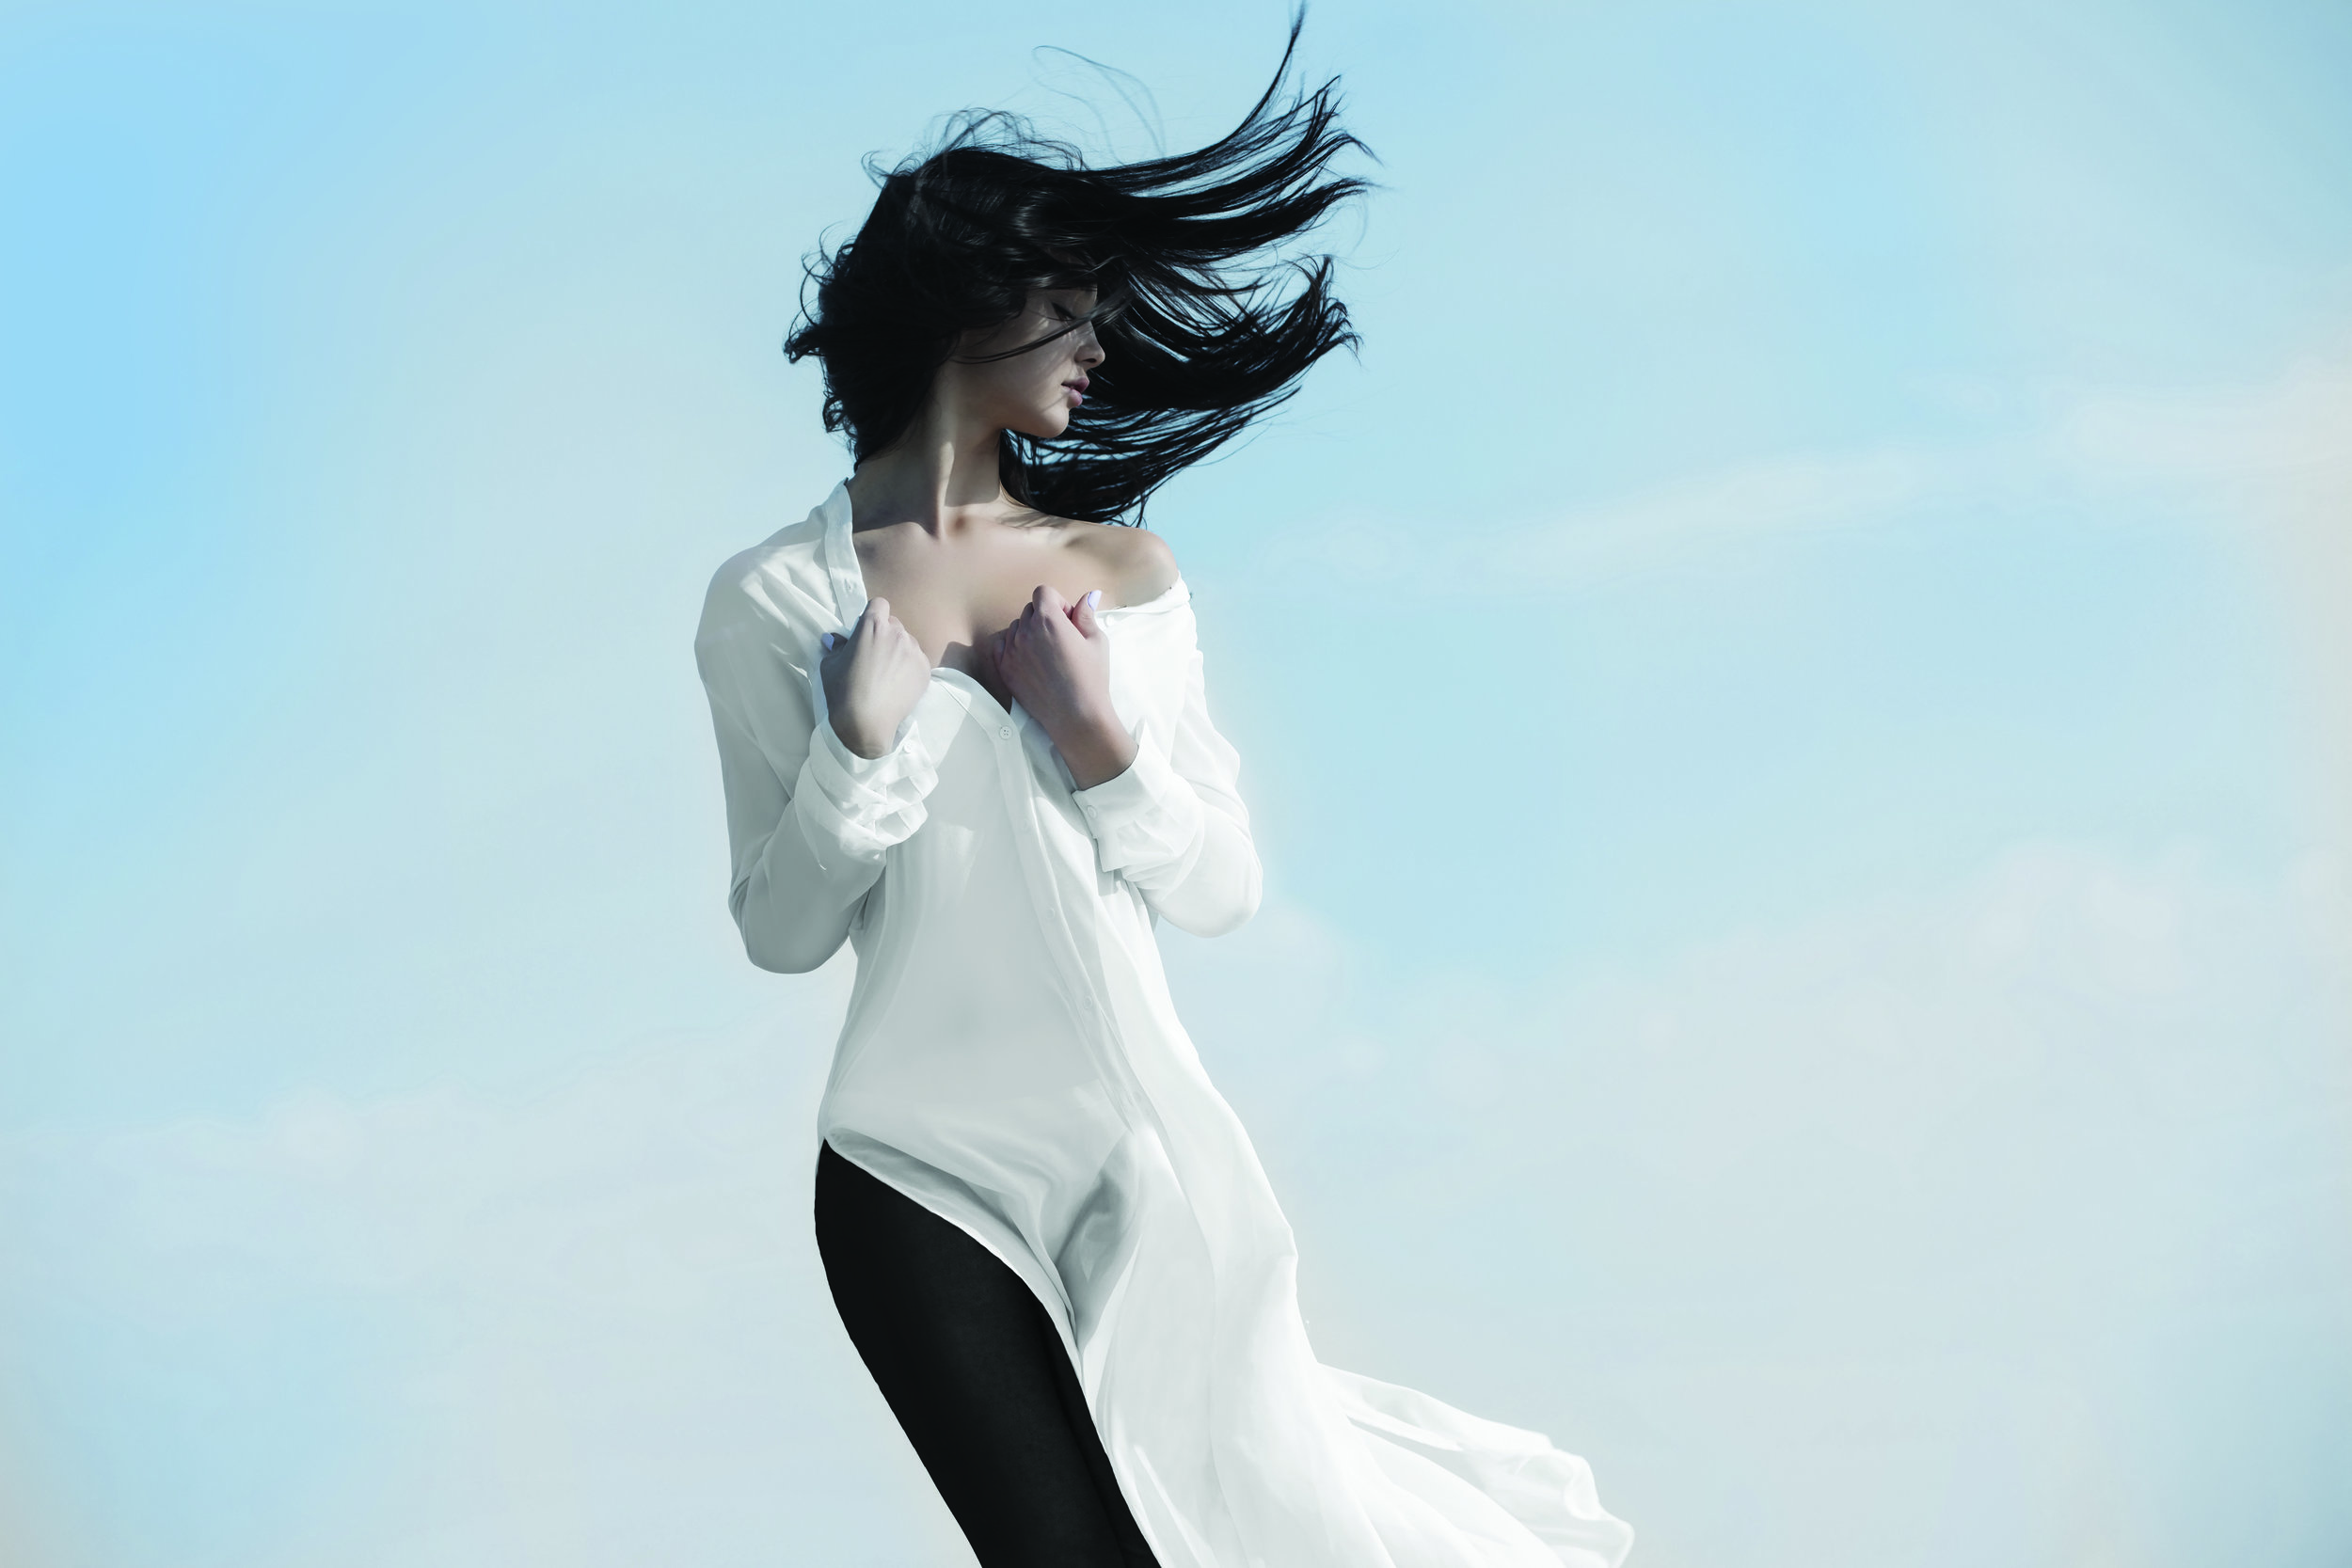 Eclipse Fashion 1 (Image 4).jpg